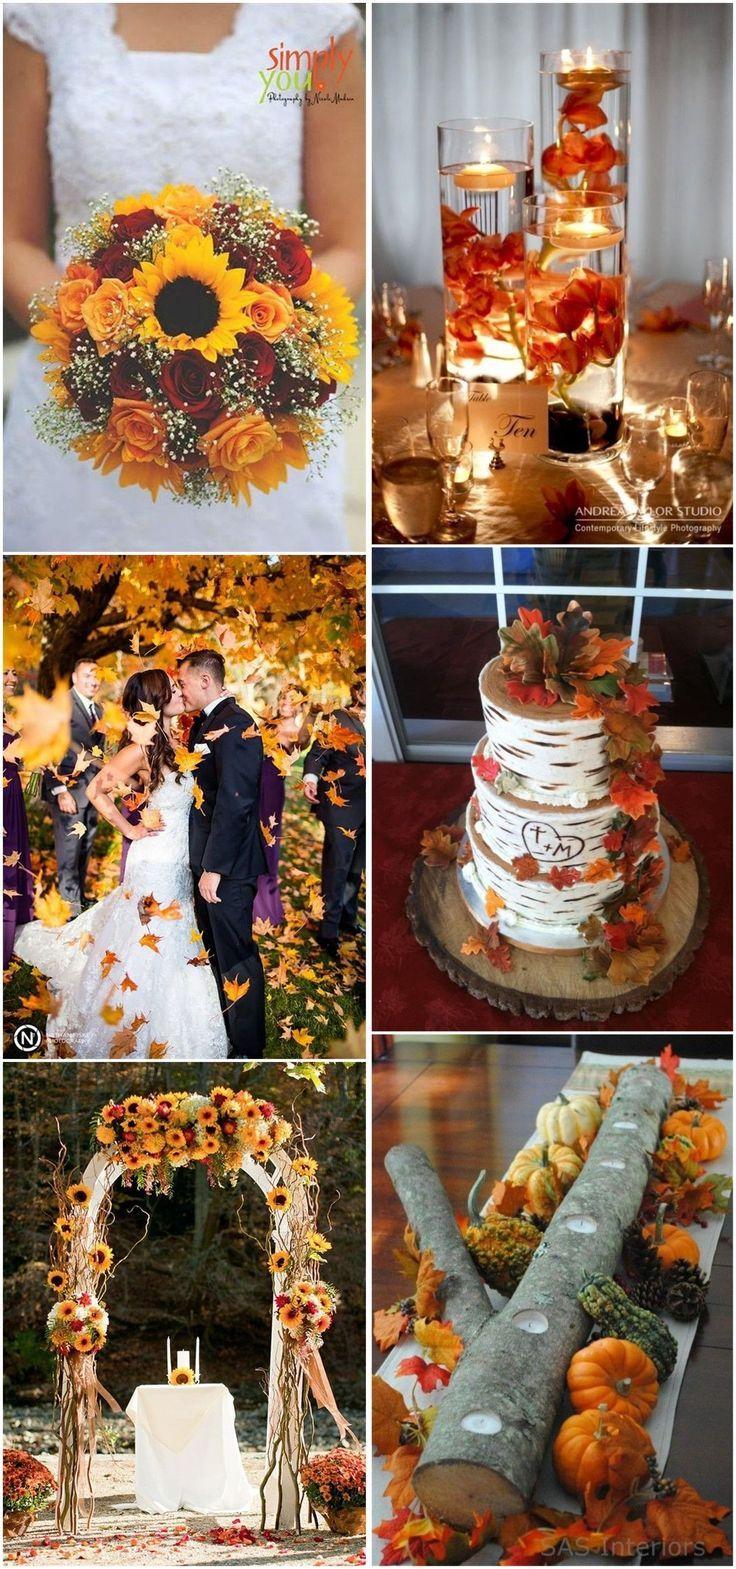 Fall weddings 23 best fall wedding ideas in 2017 see more fall weddings 23 best fall wedding ideas in 2017 see more junglespirit Choice Image